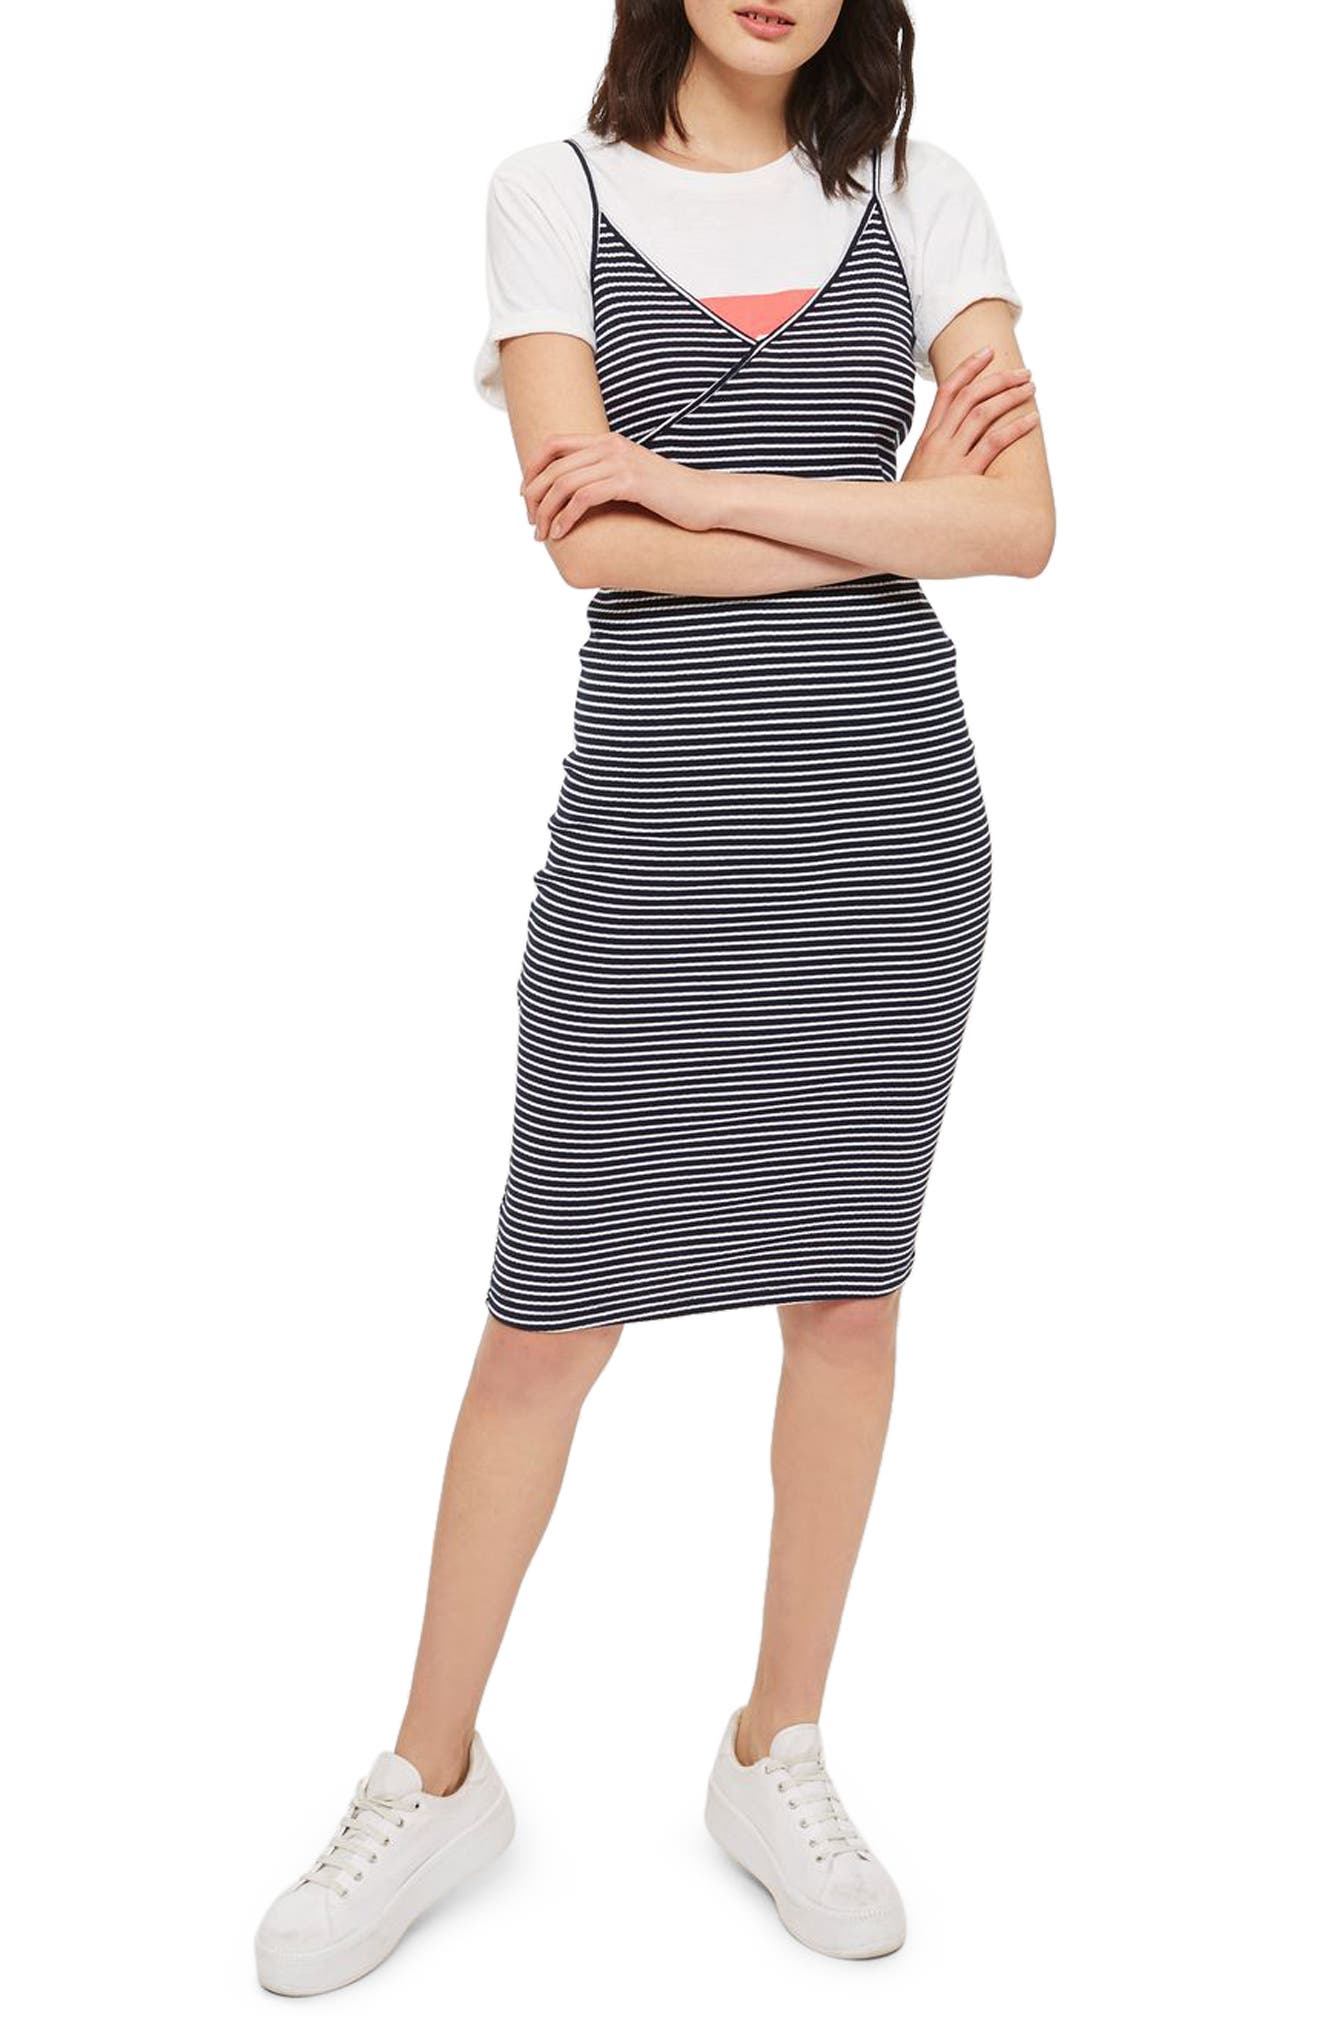 Kaia Stripe Tank Dress, Main, color, 410